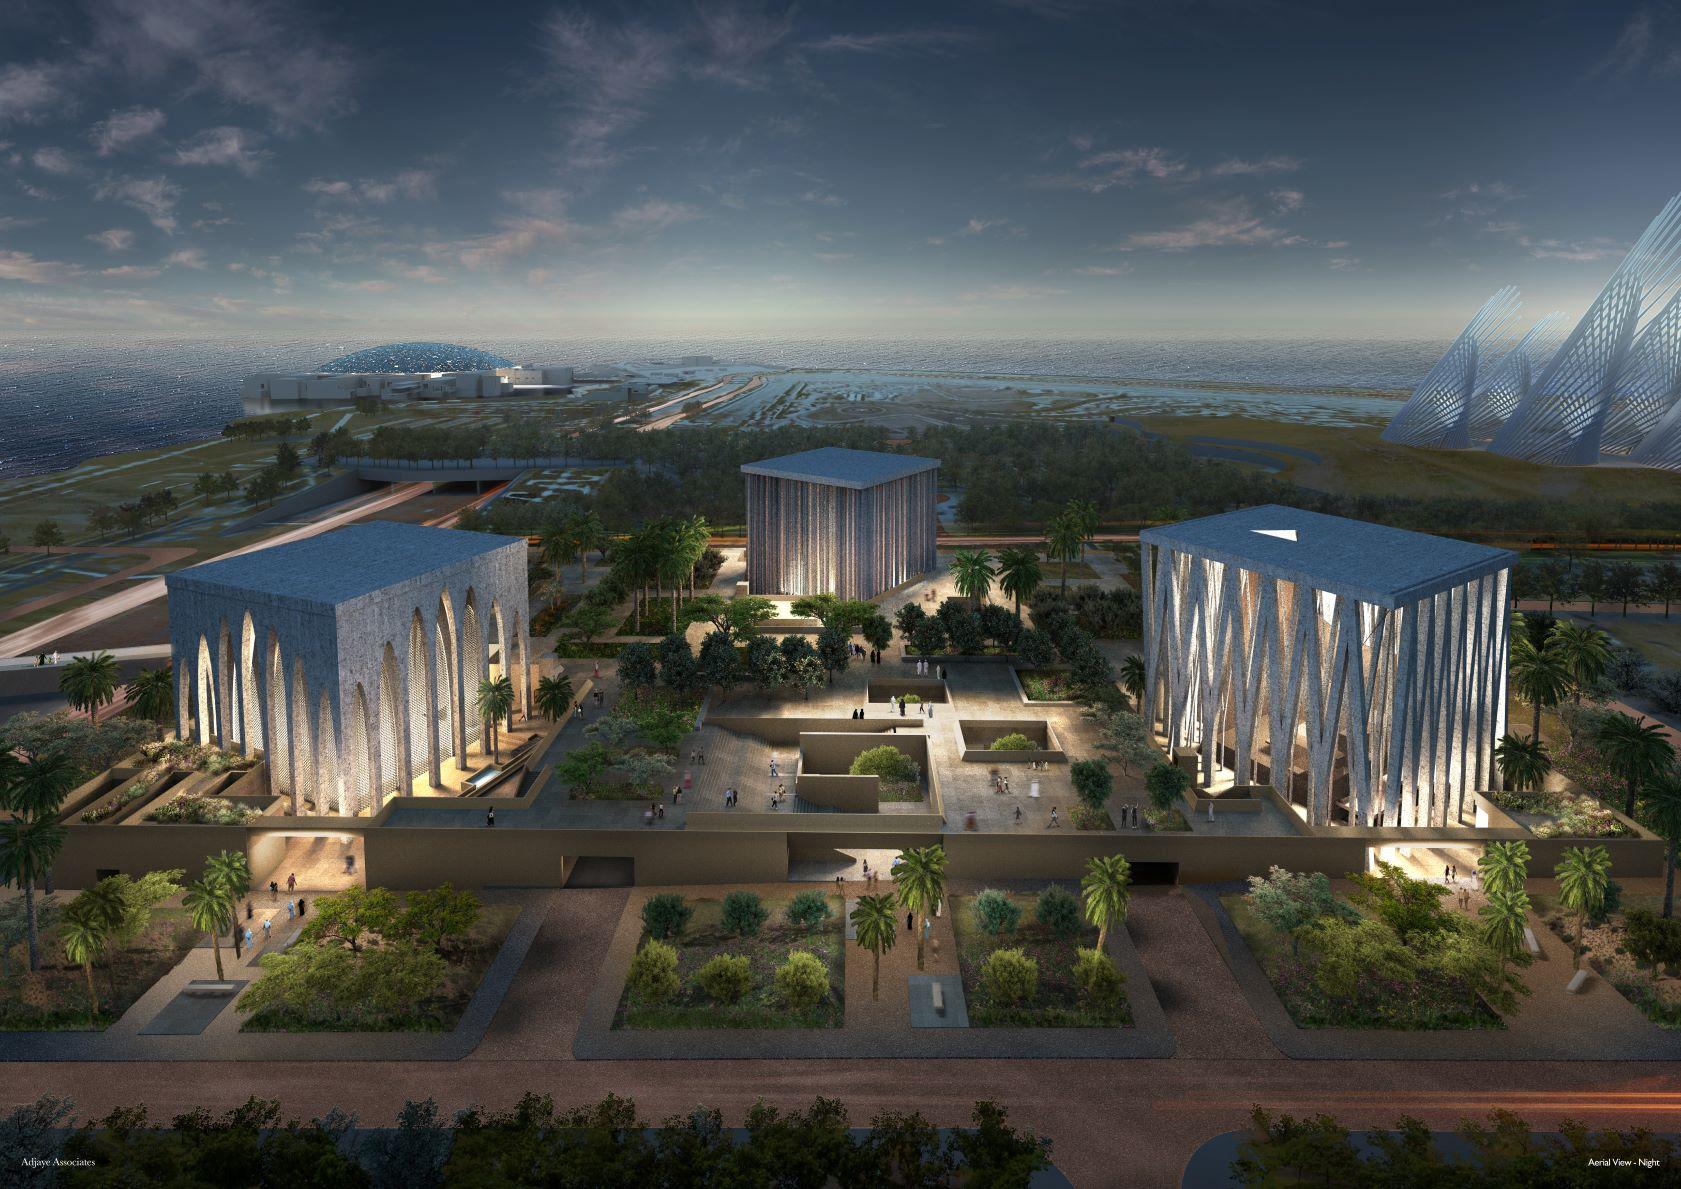 David Adjaye designs Abrahamic Family House in Abu Dhabi comprising a mosque, church and synagogue